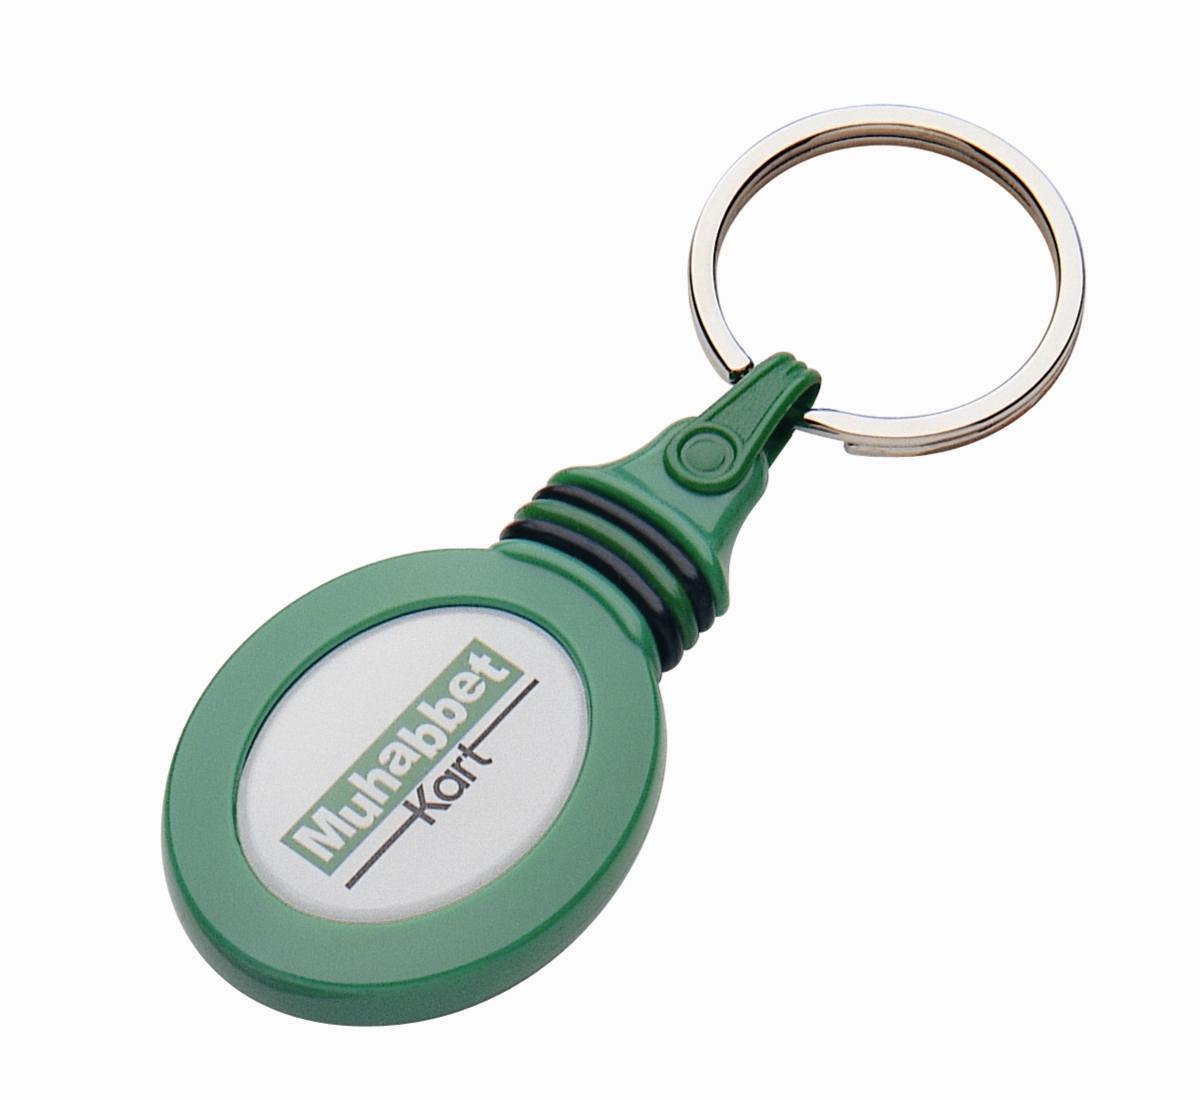 Werbeartikel: Kunststoff-Schluesselanhänger,=Autoschlüssel